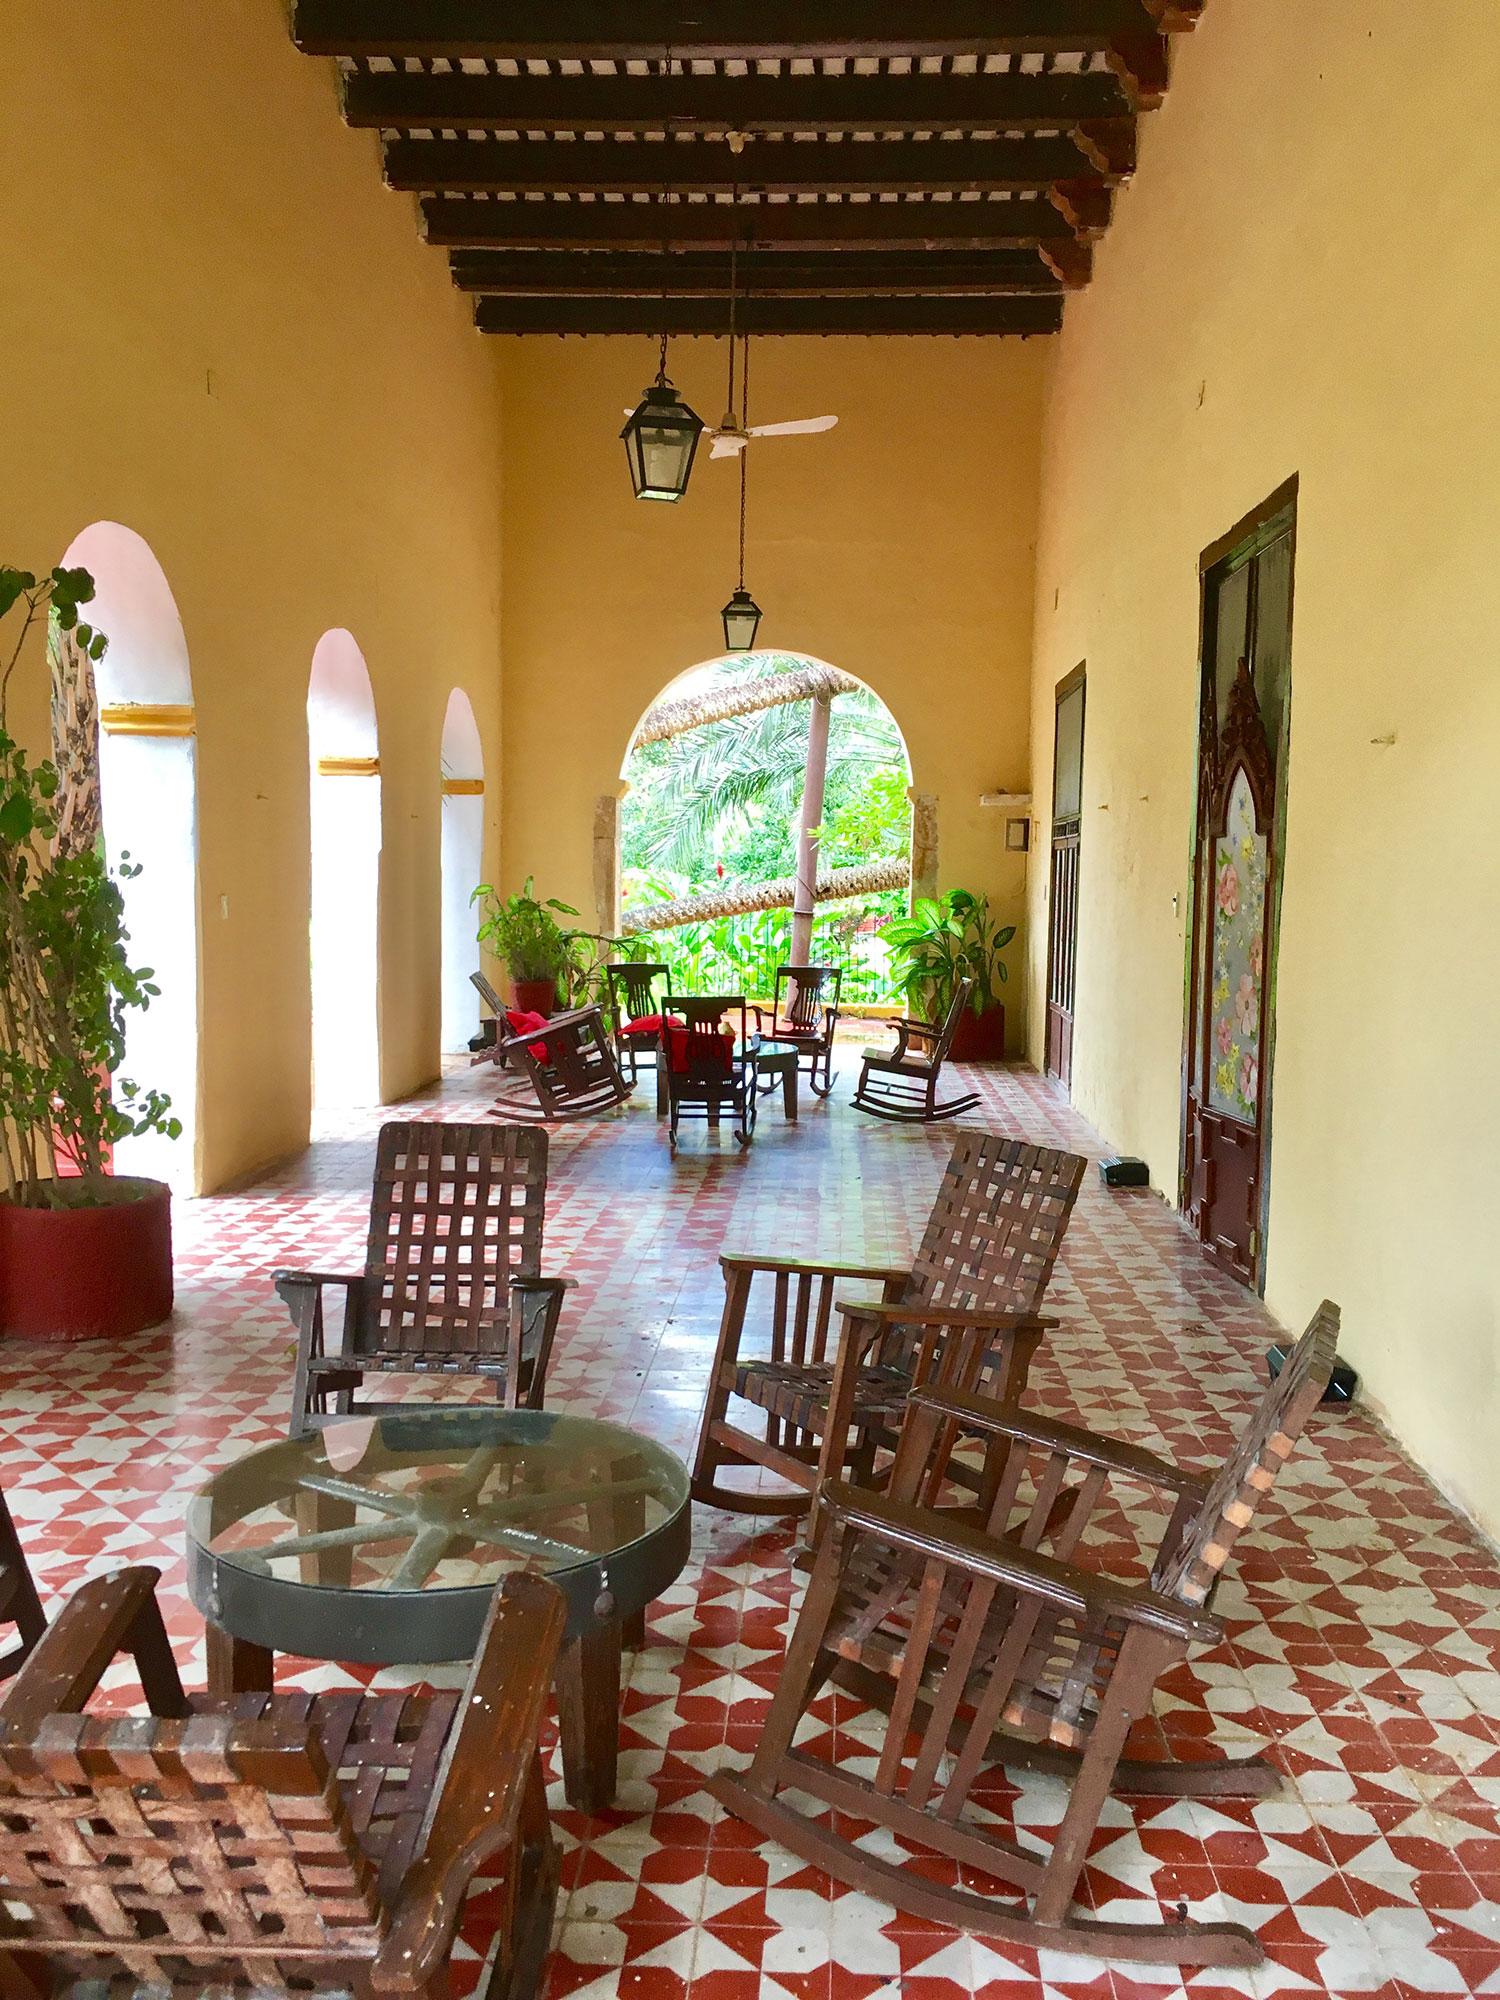 The veranda of the main house.